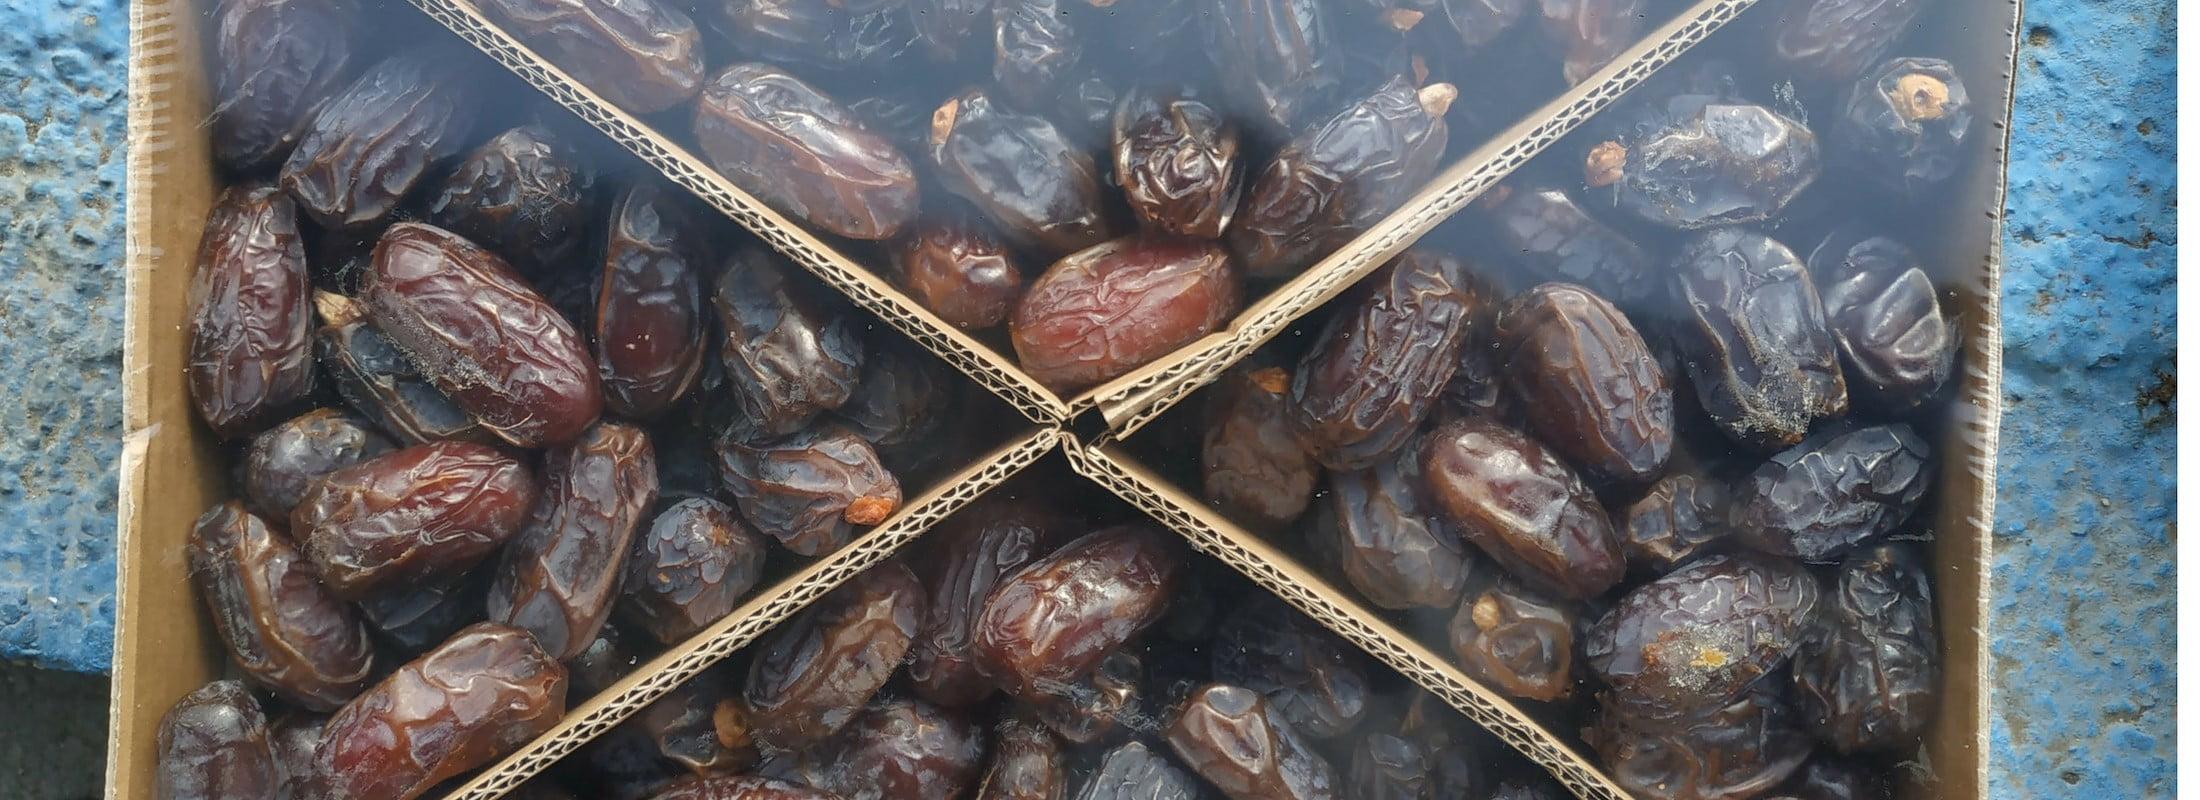 Contacto 5kg bio medjool medjoul datteln dattes dadels dates dadler dadlar datiles 10